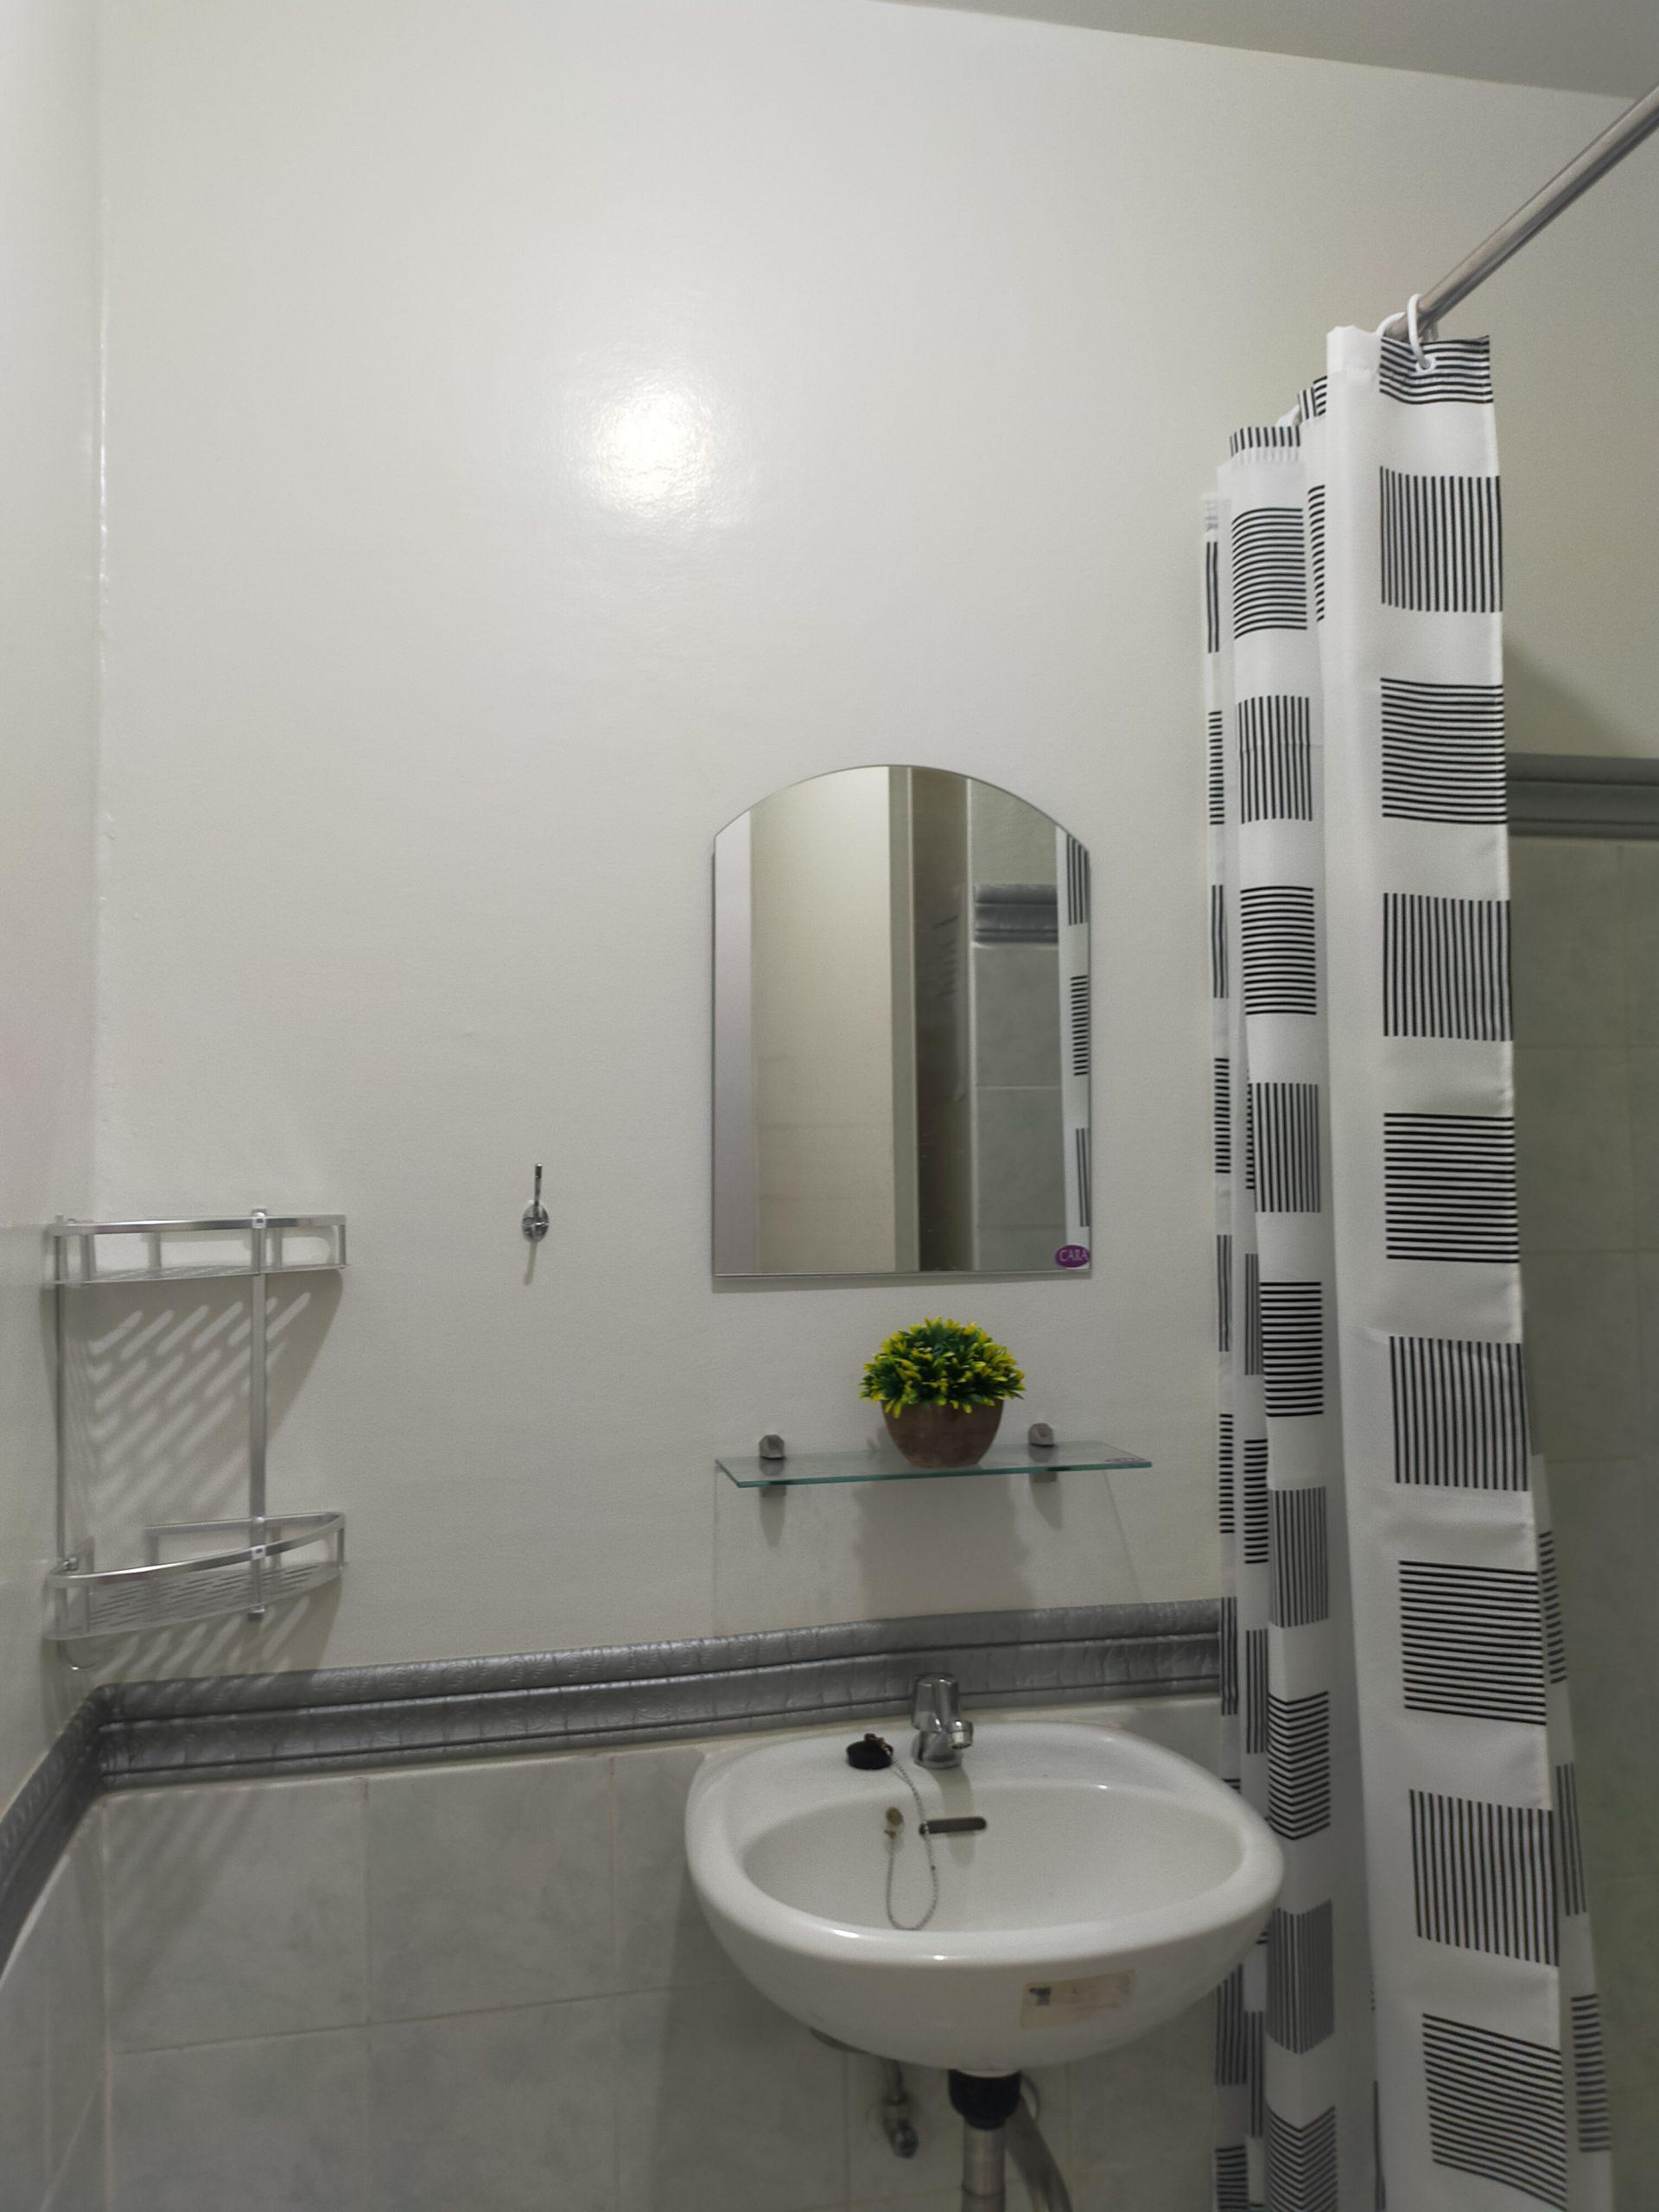 Male Condo Bedspace in Sucat, Muntinlupa